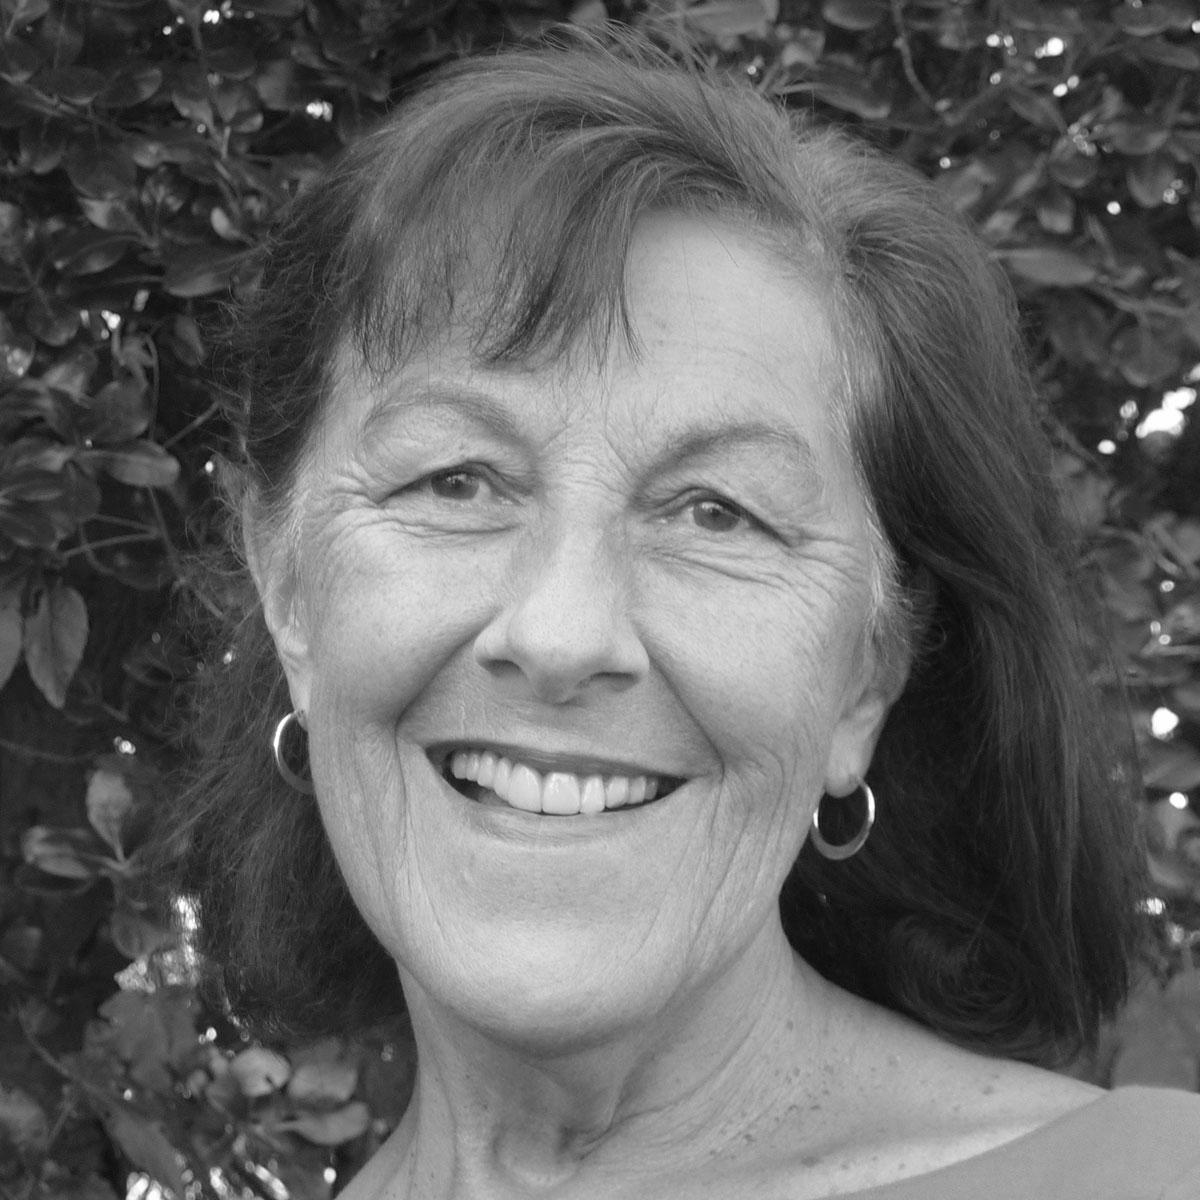 Maureen-Payne-BW